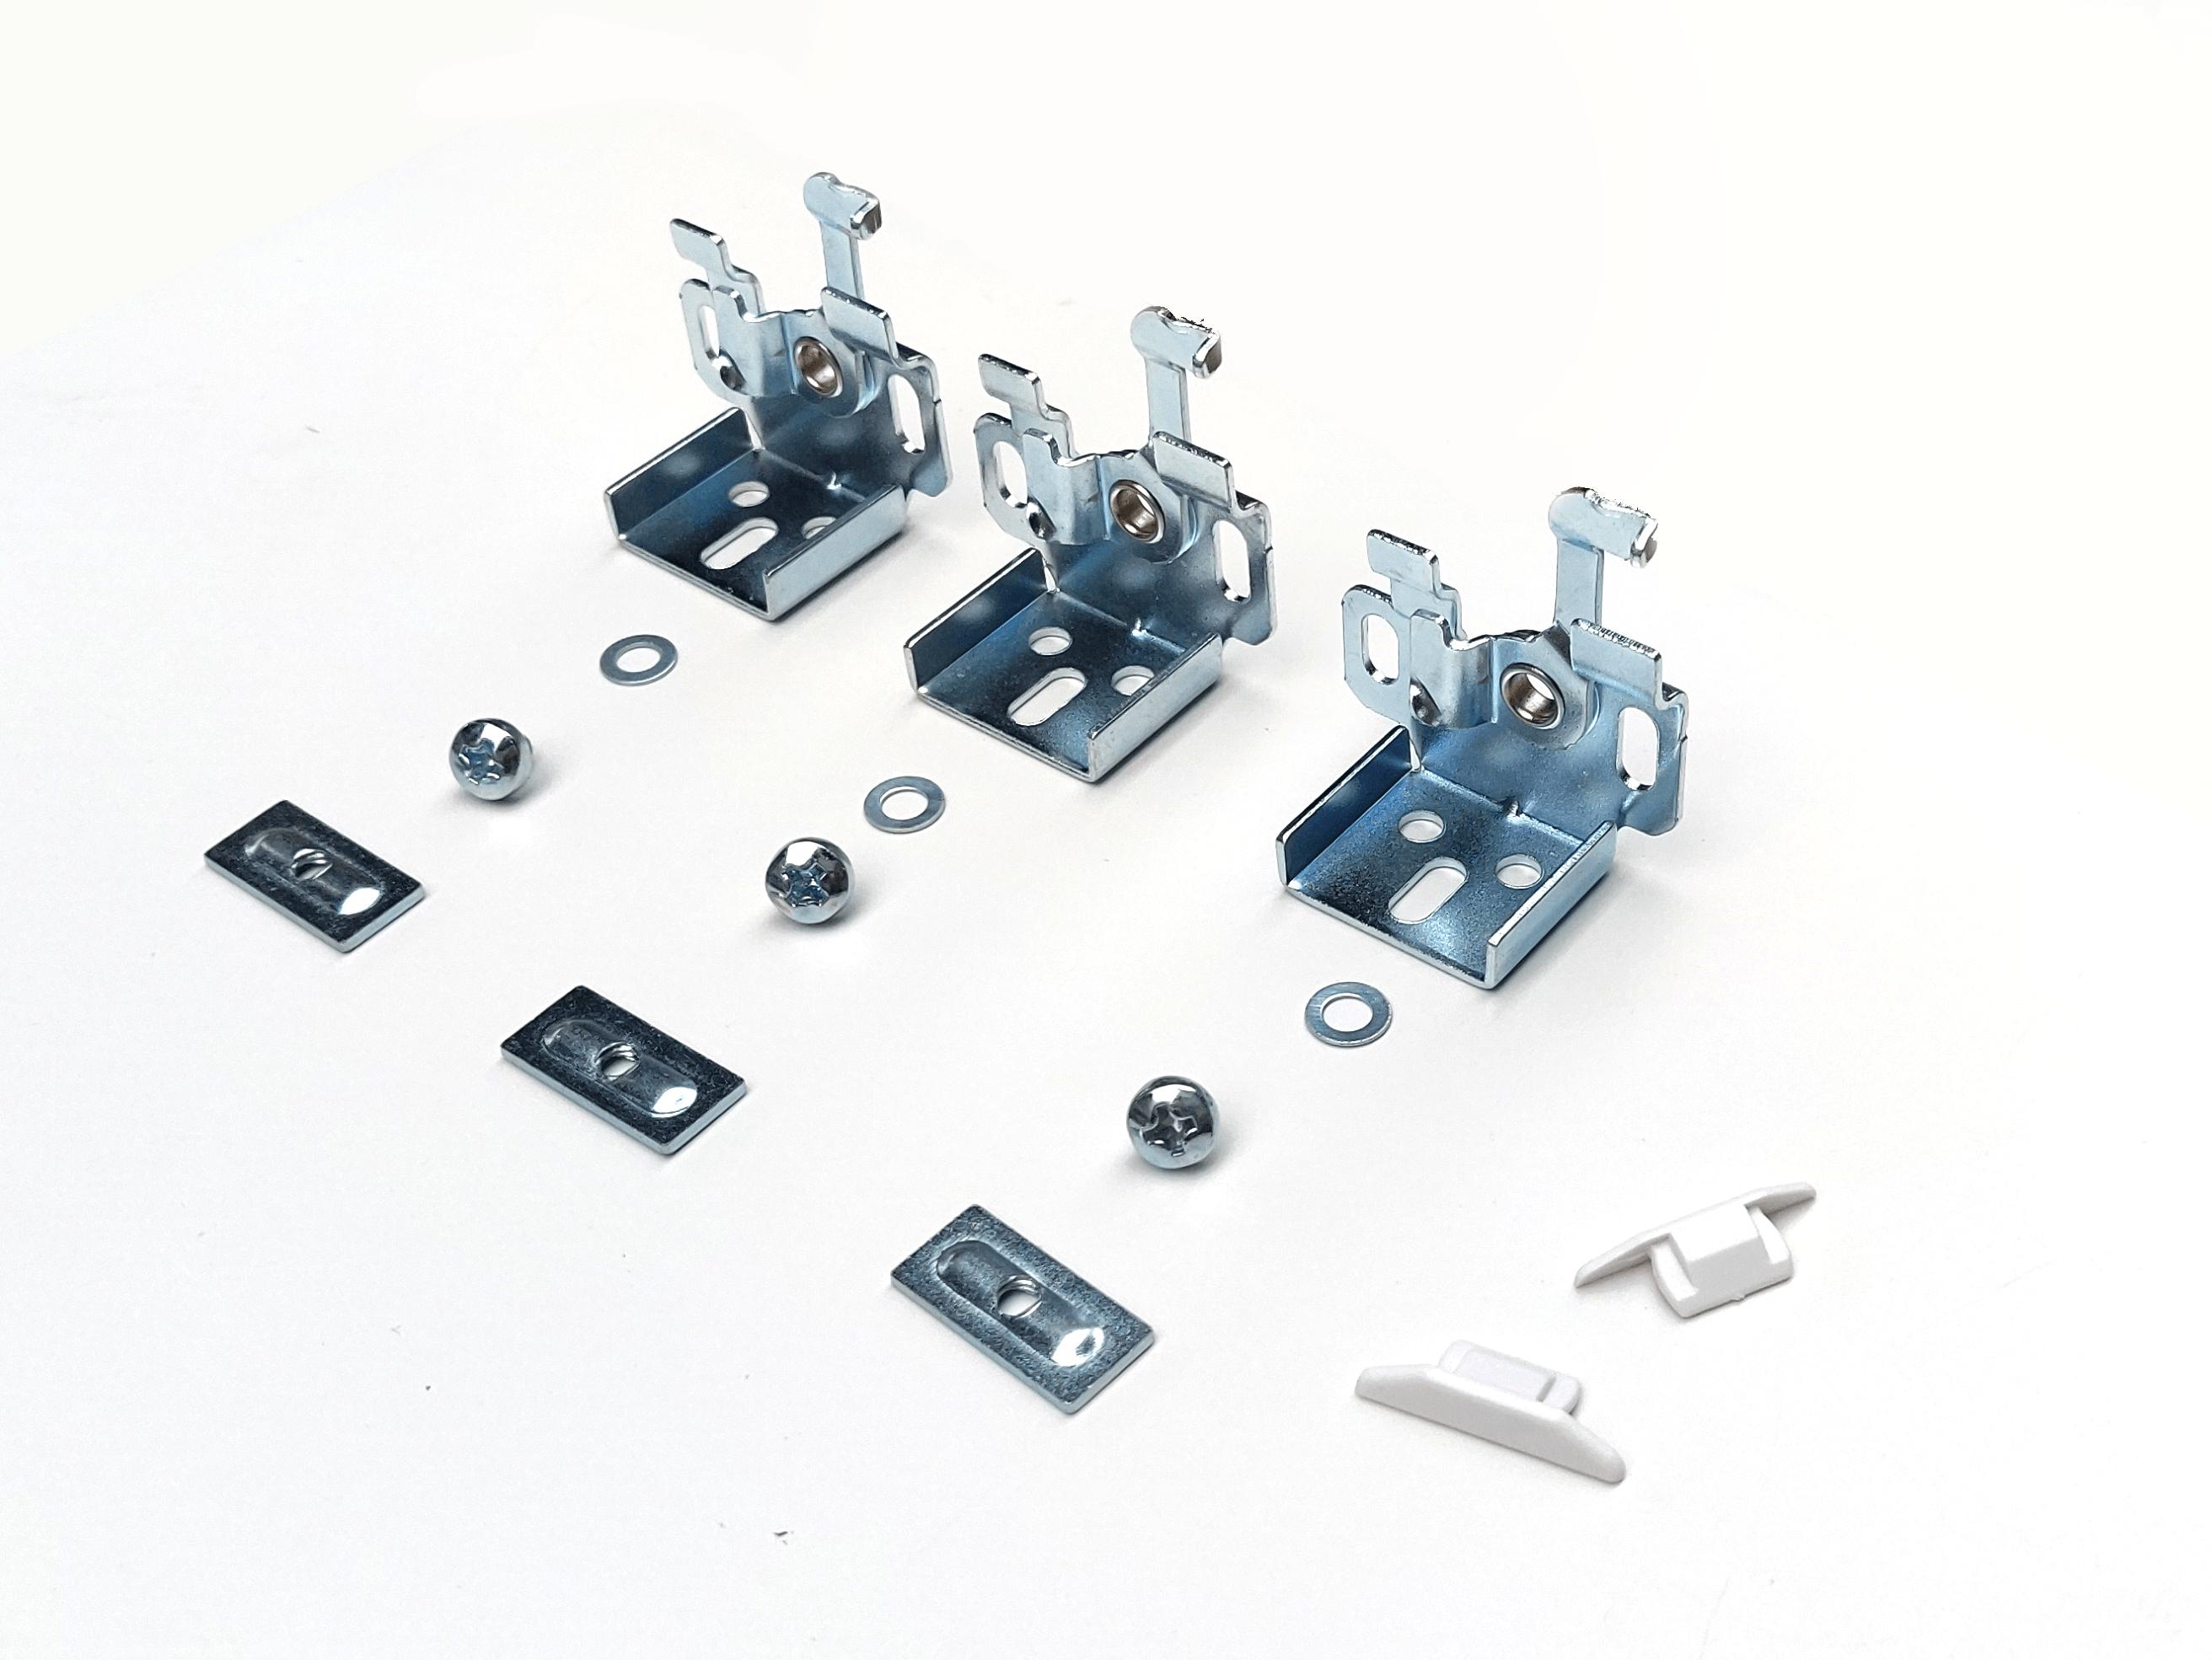 Luxaflex ophangen zonder boren